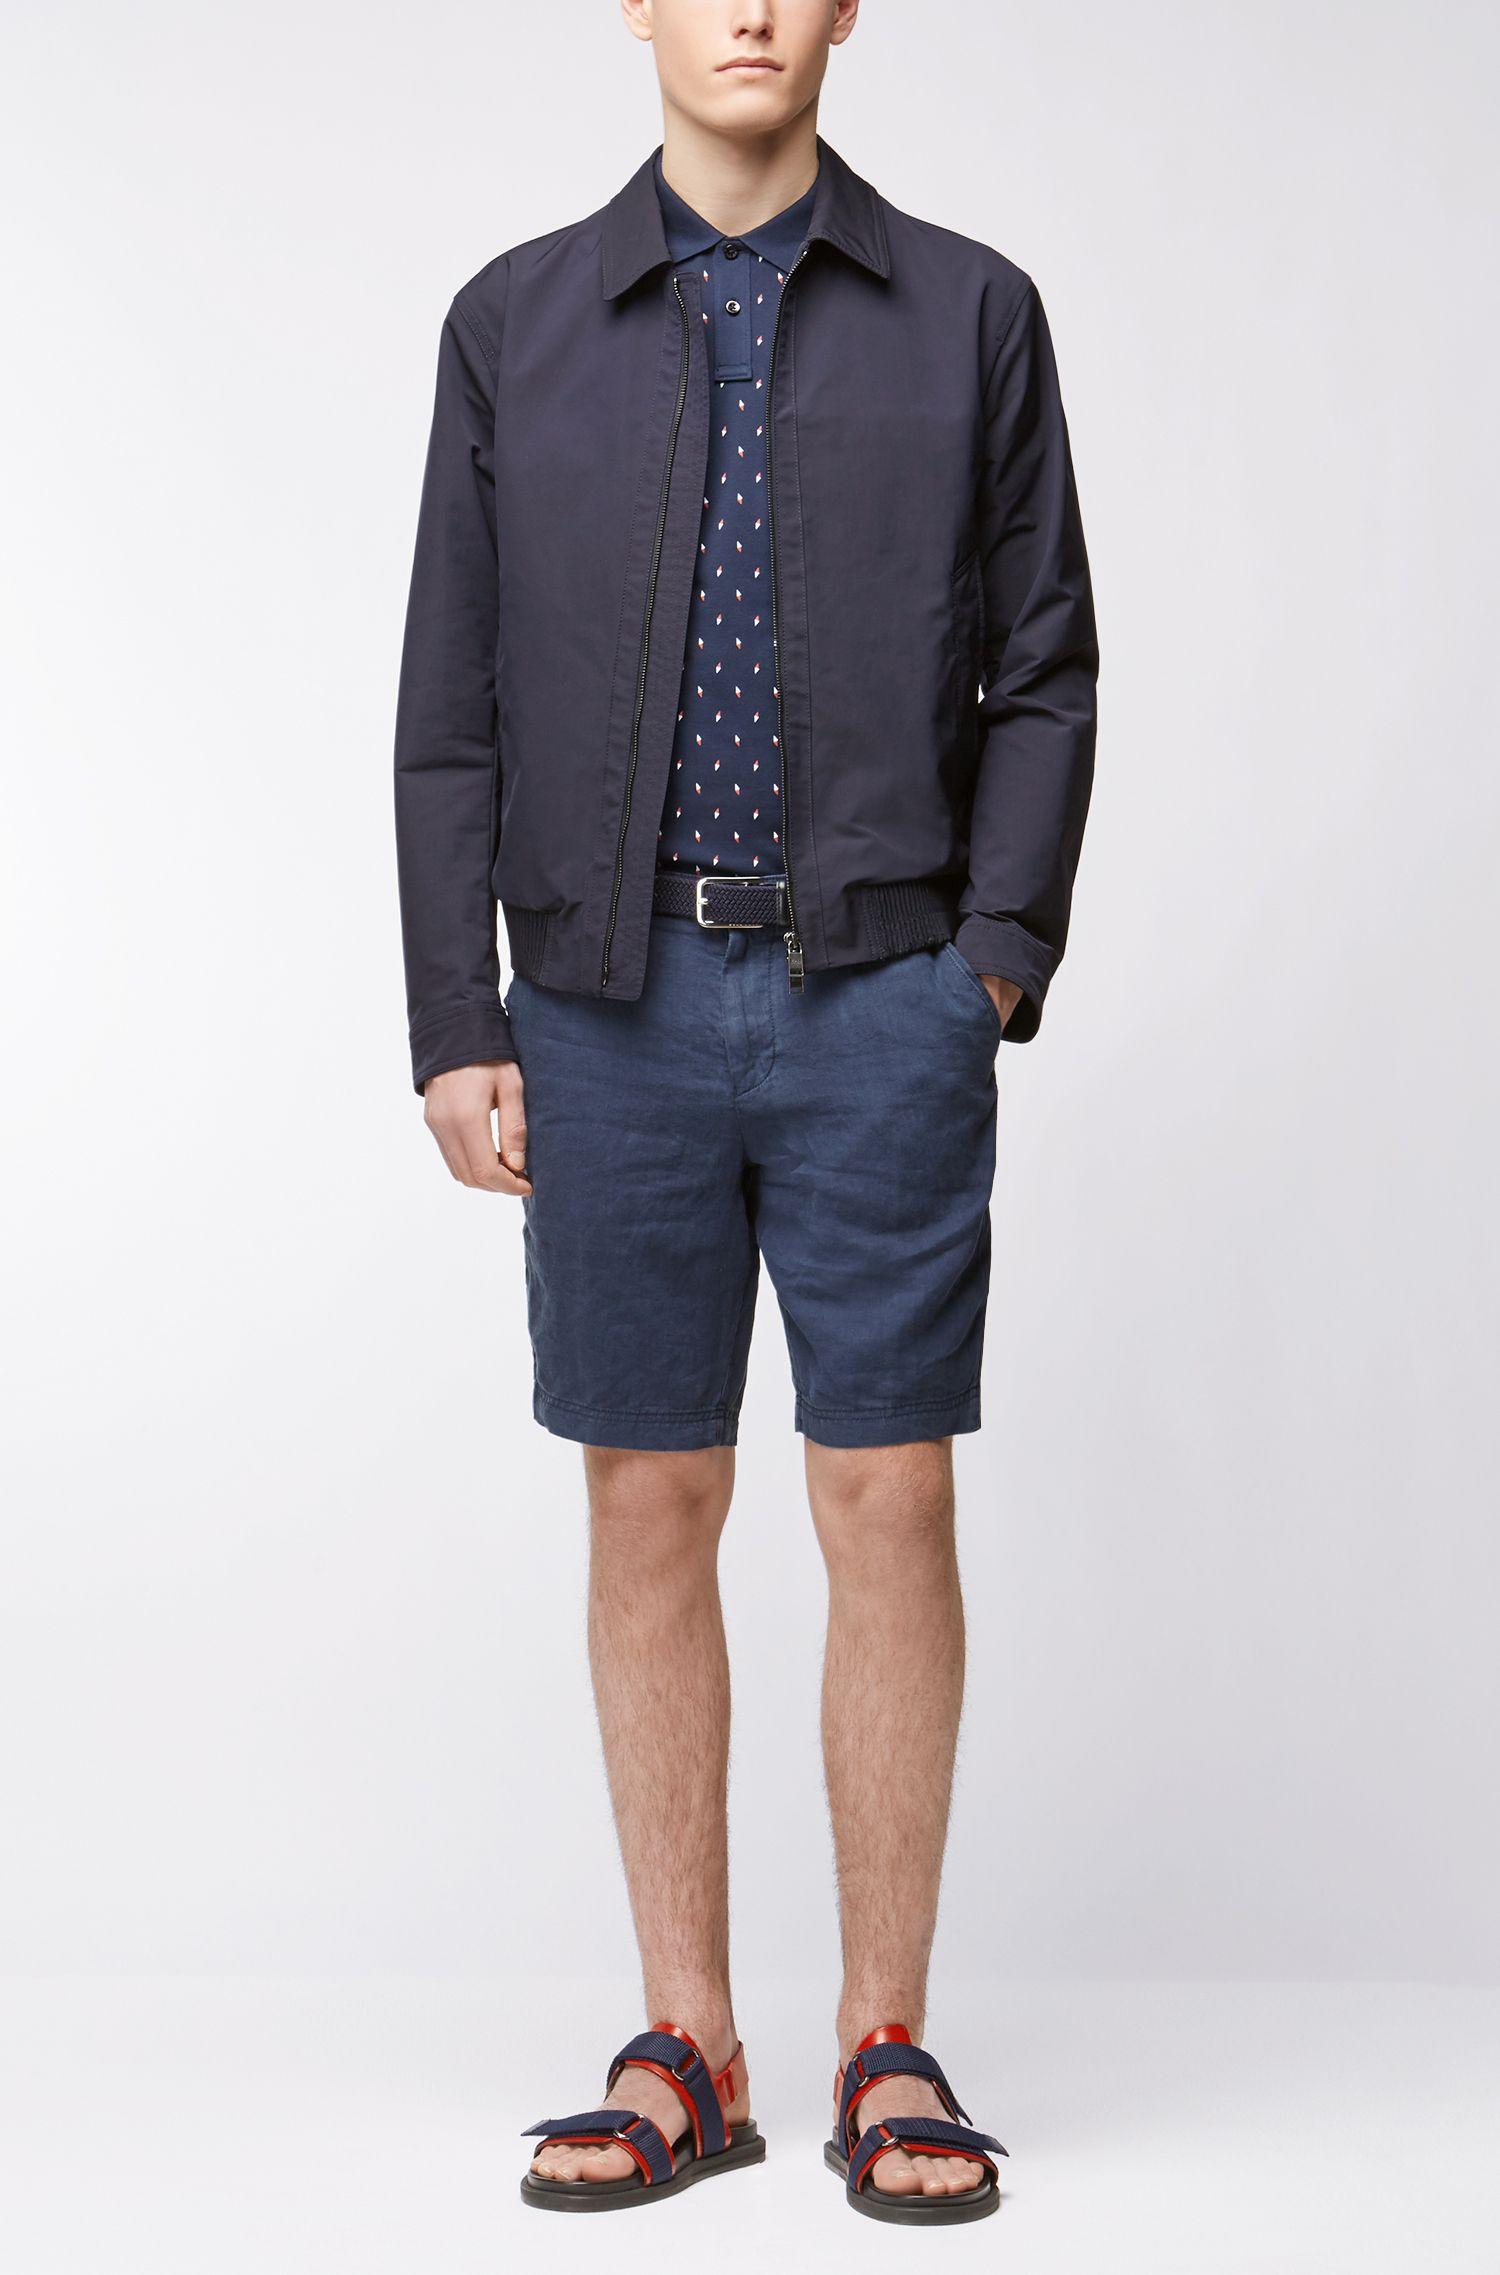 Slim-Fit Poloshirt aus Baumwoll-Piqué mit Kompassnadel-Print